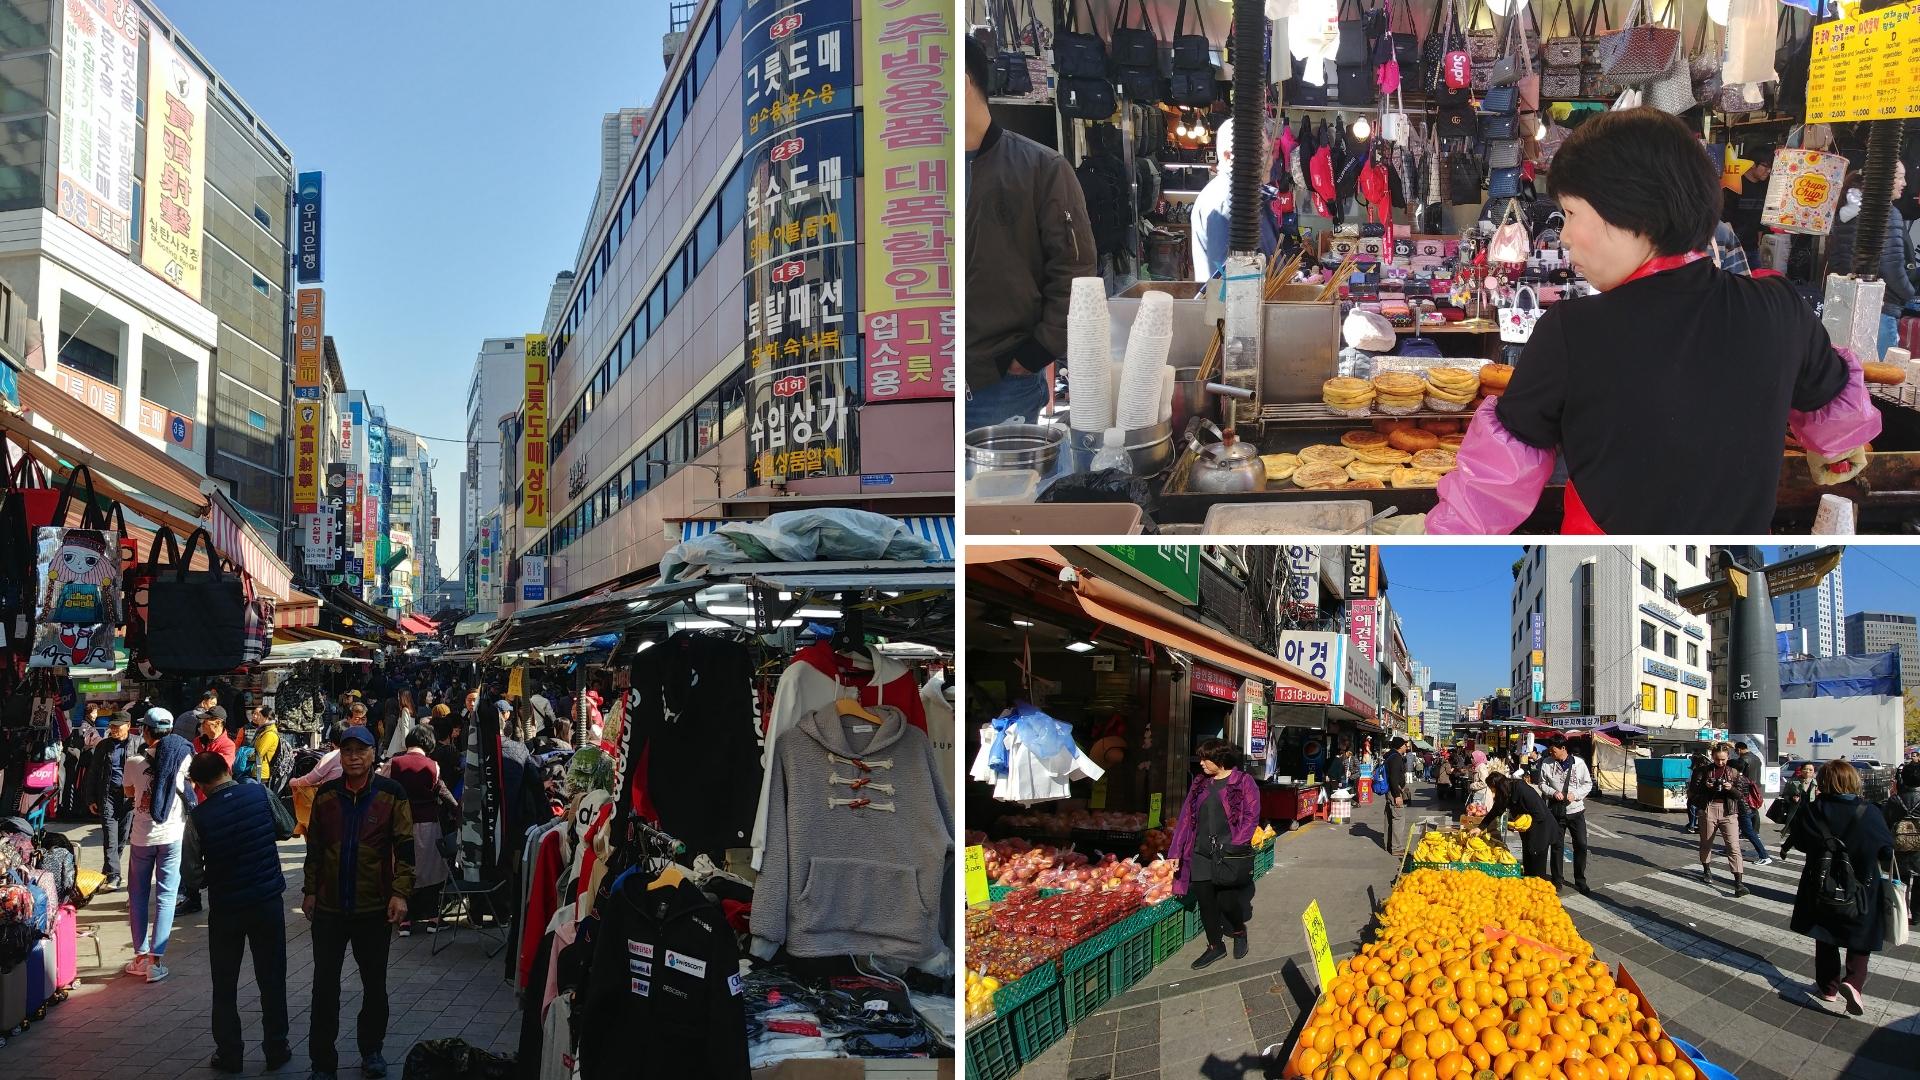 seoul marche namdaemun street food coree du sud blog voyage arpenter le chemin